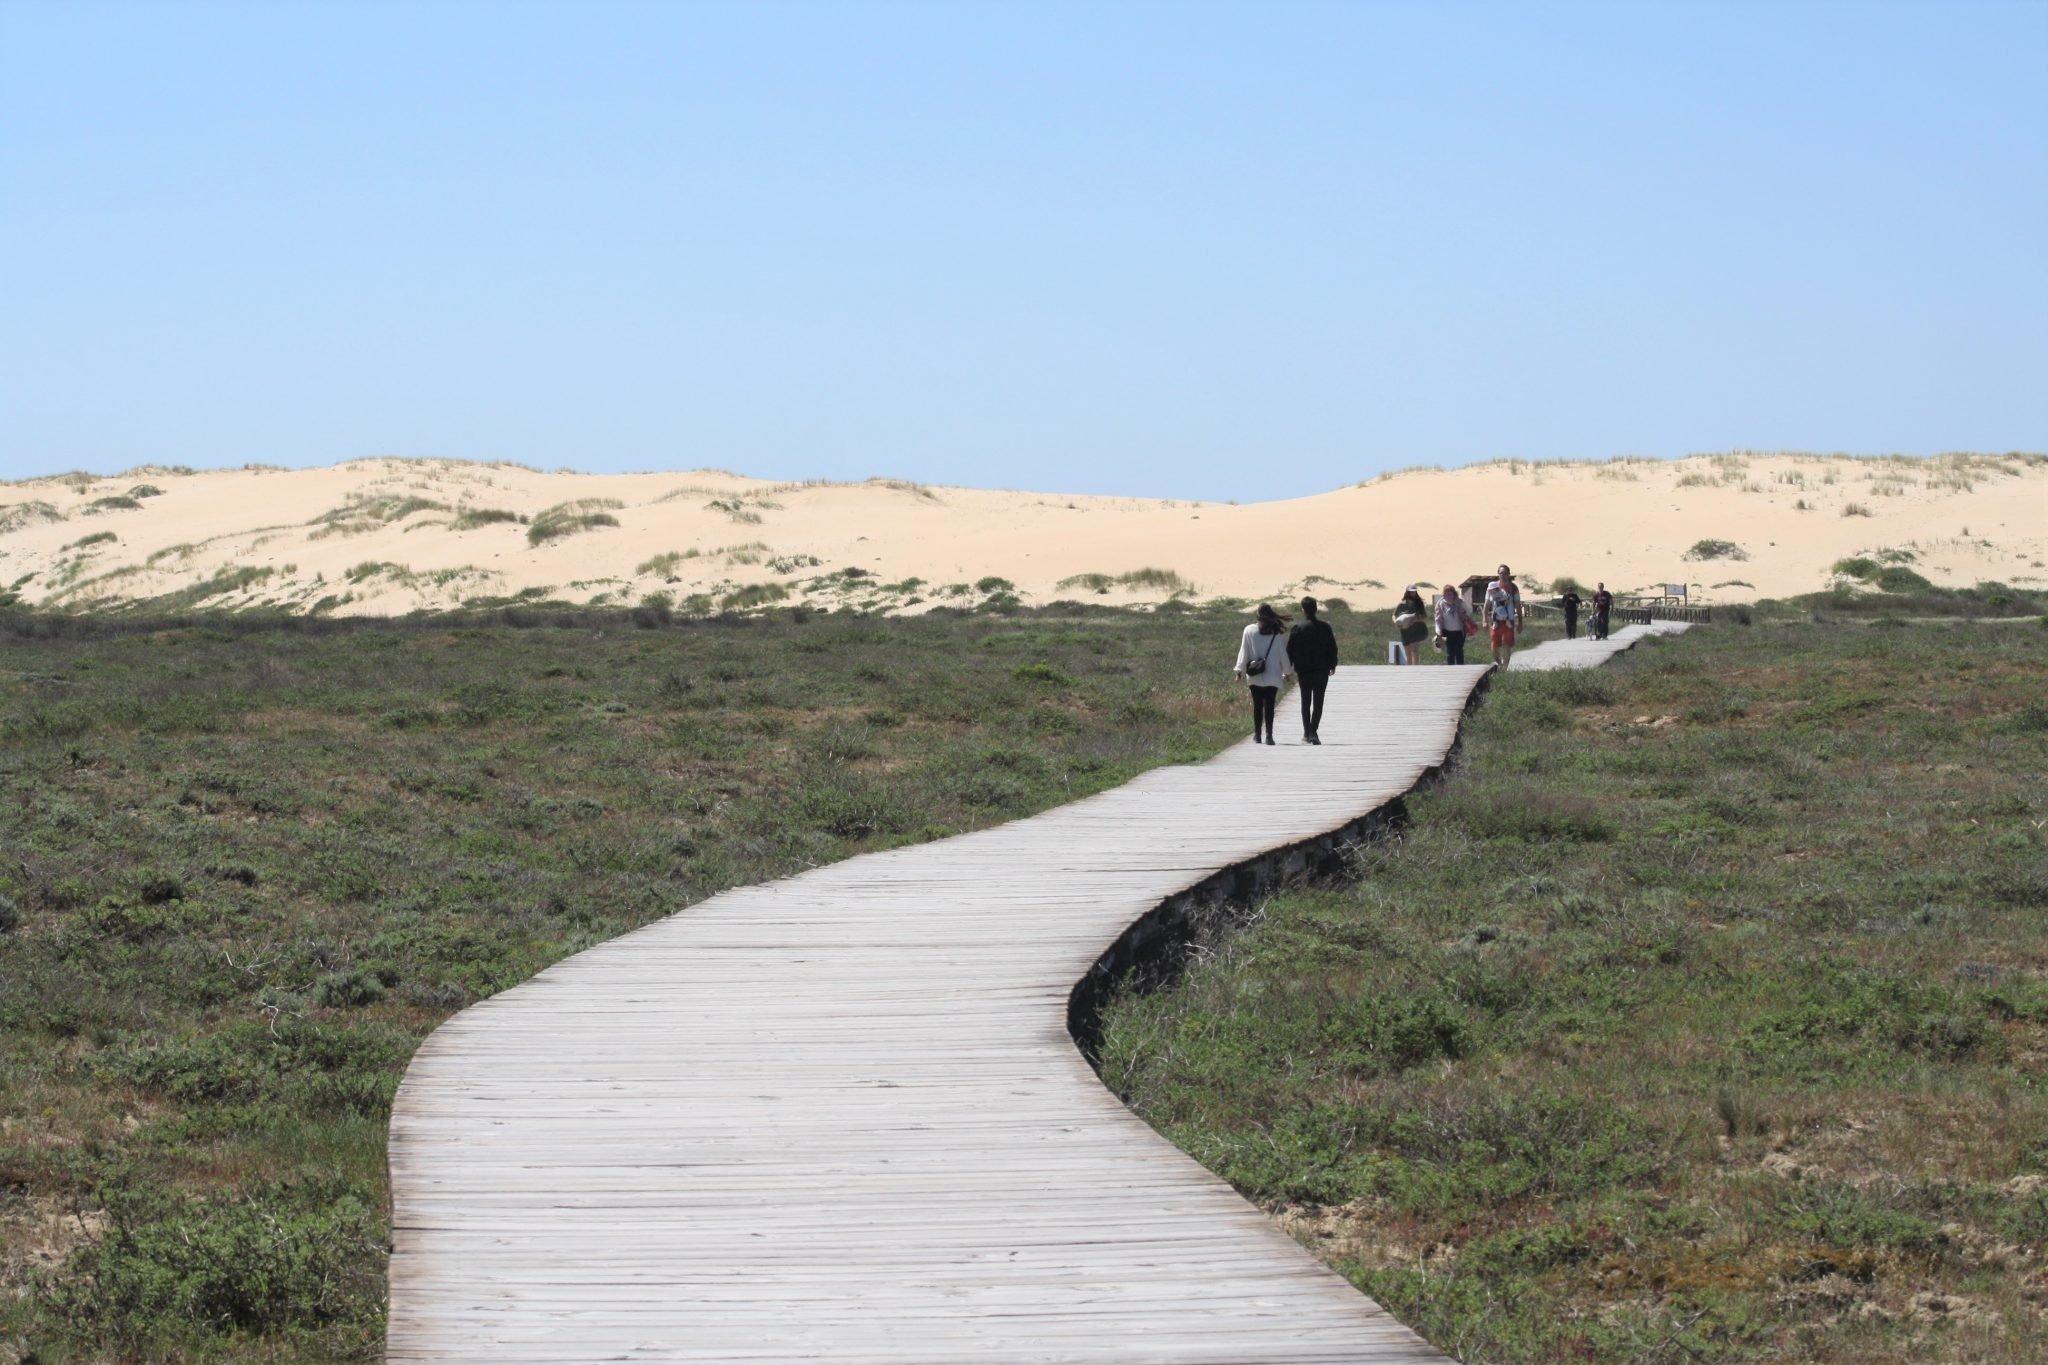 Galicia Espanja kokemuksia matka rannat